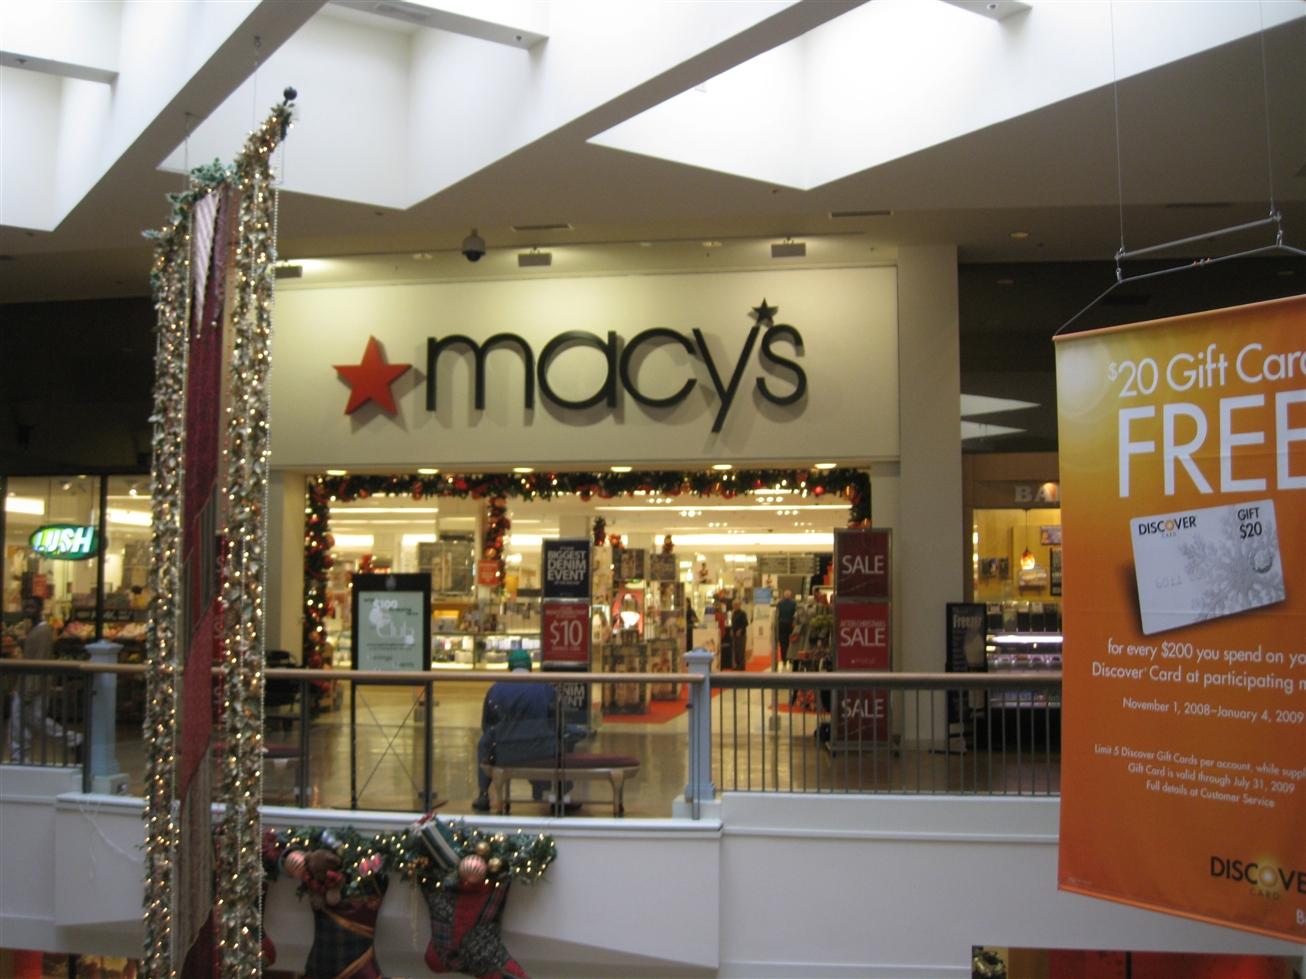 Perimeter Mall Macys in Dunwoody, GA